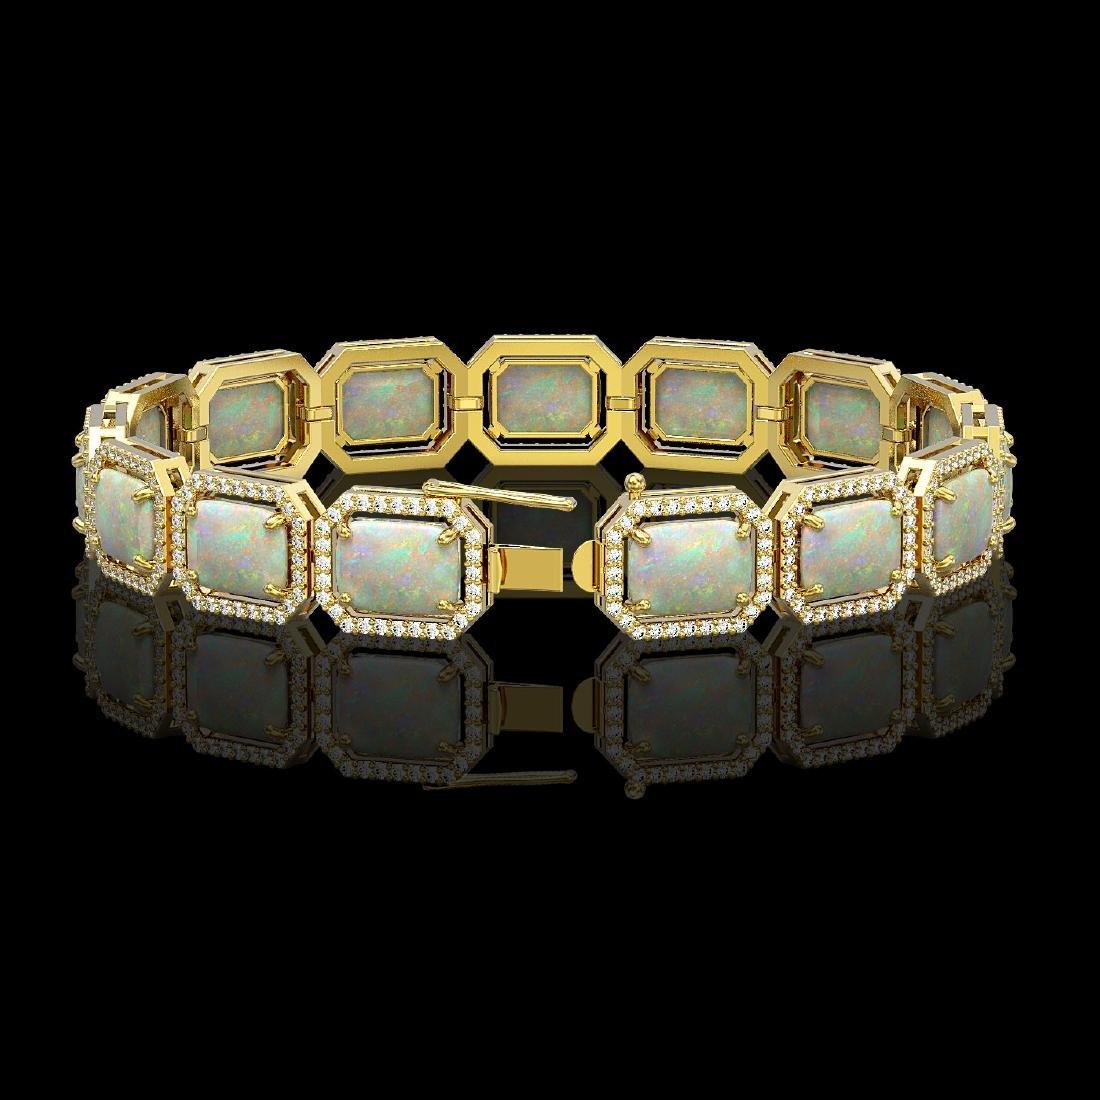 24.37 CTW Opal & Diamond Halo Bracelet 10K Yellow Gold - 2